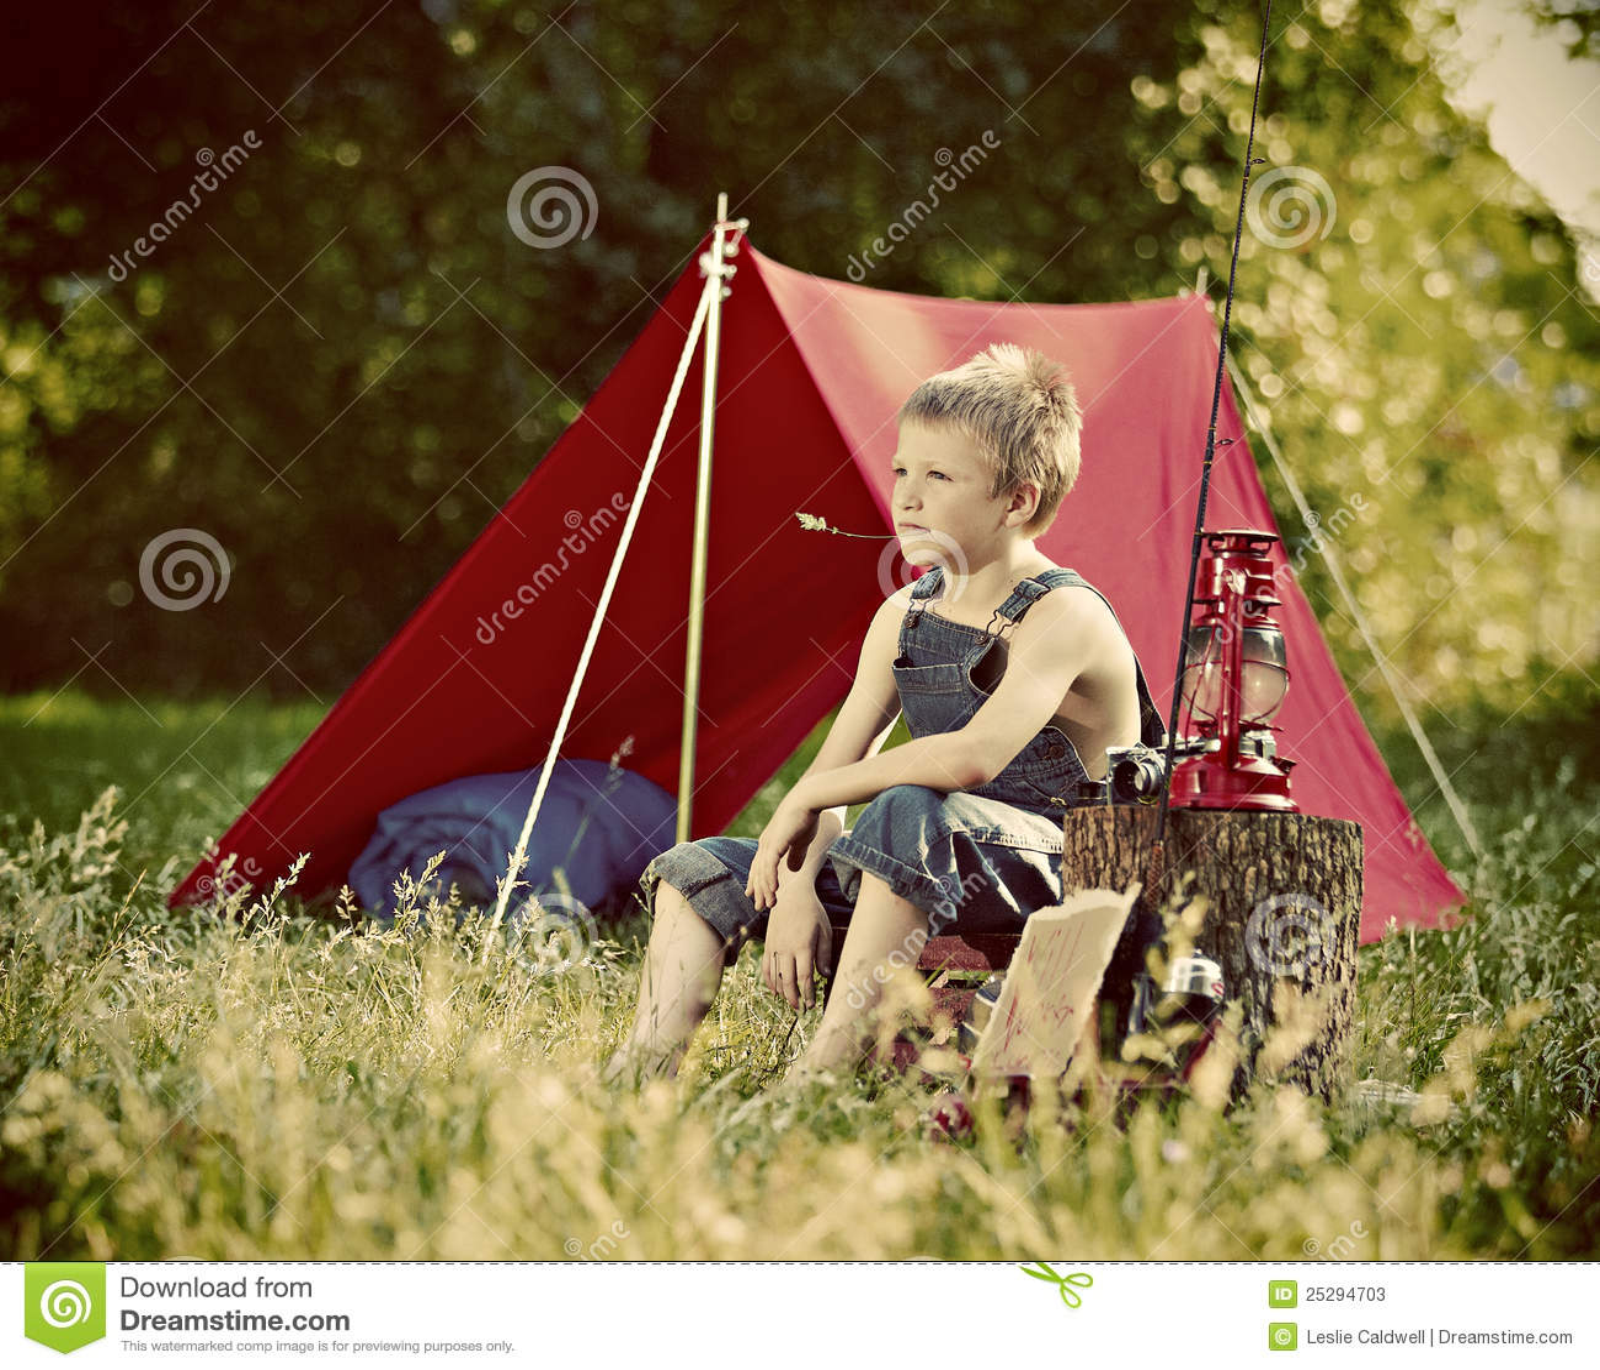 Camper Boys